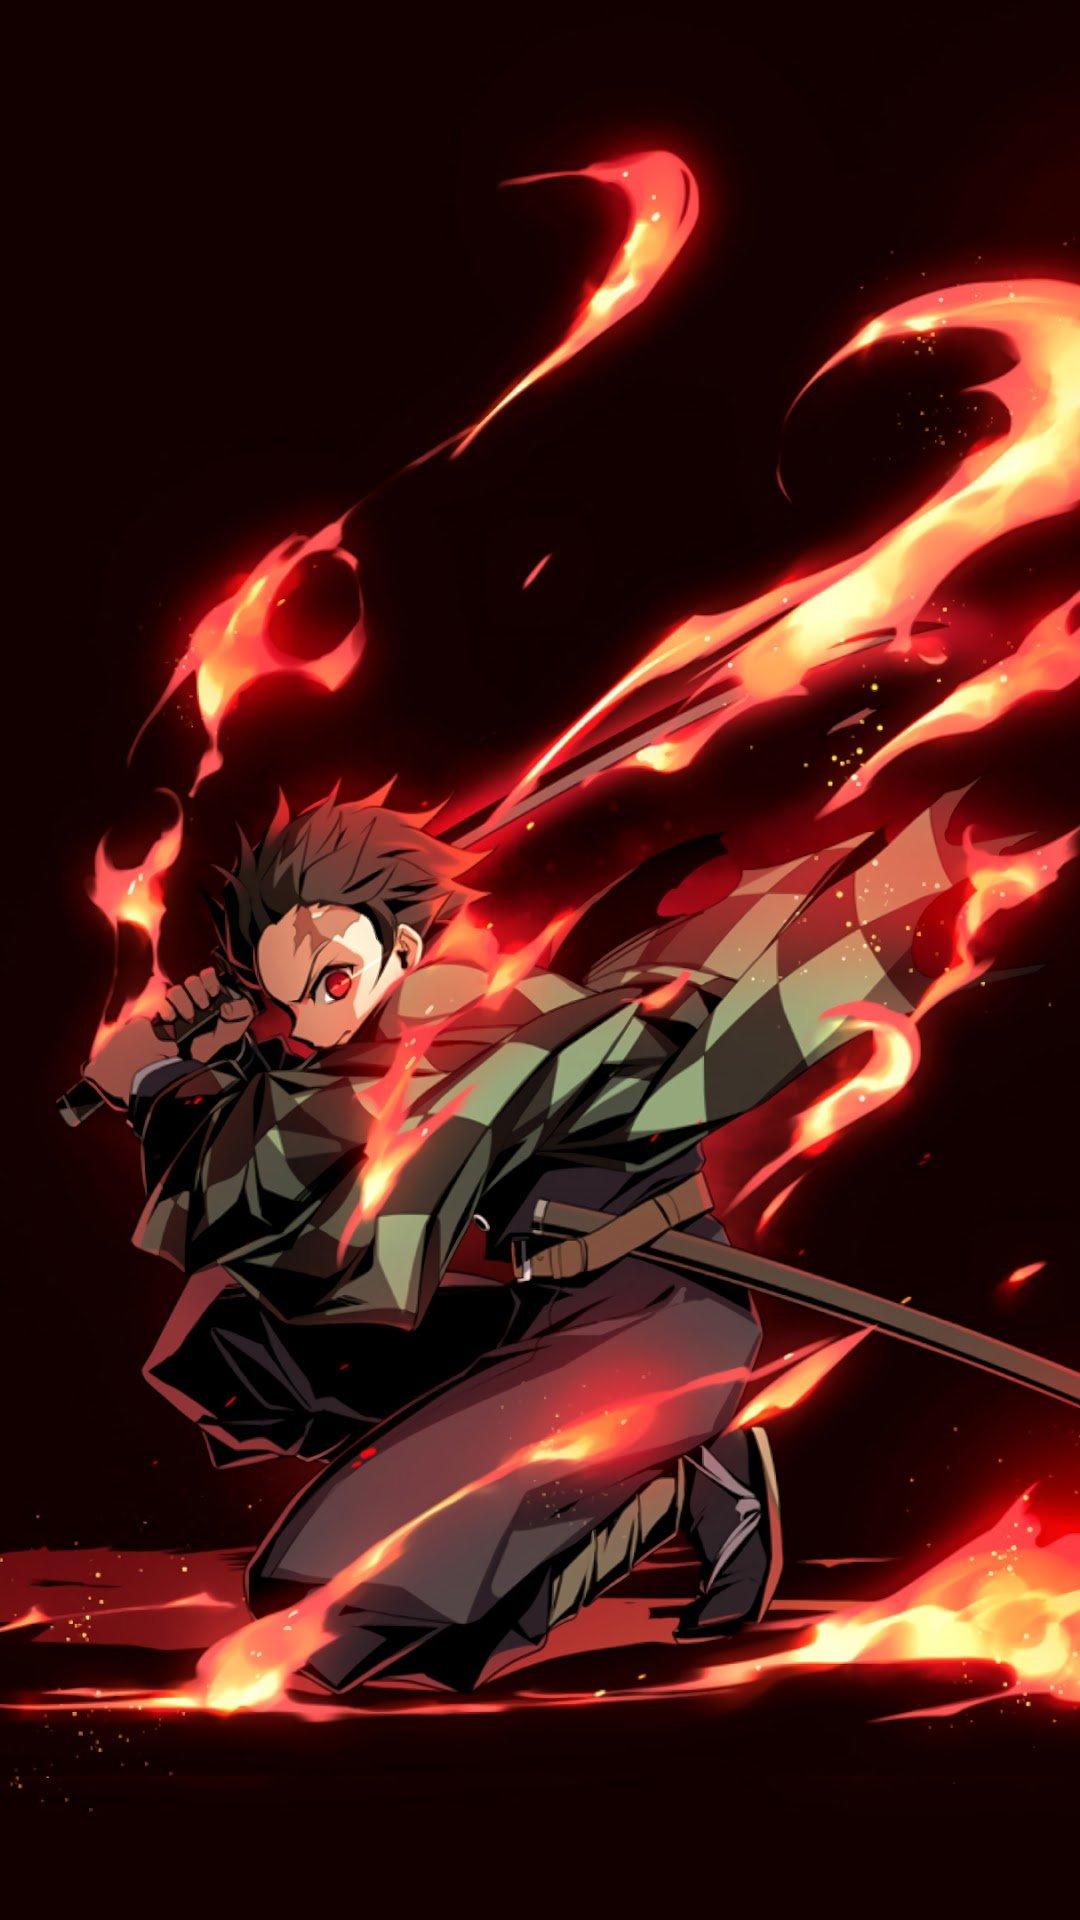 Hd Anime Wallpaper Iphone 11 1080x1920